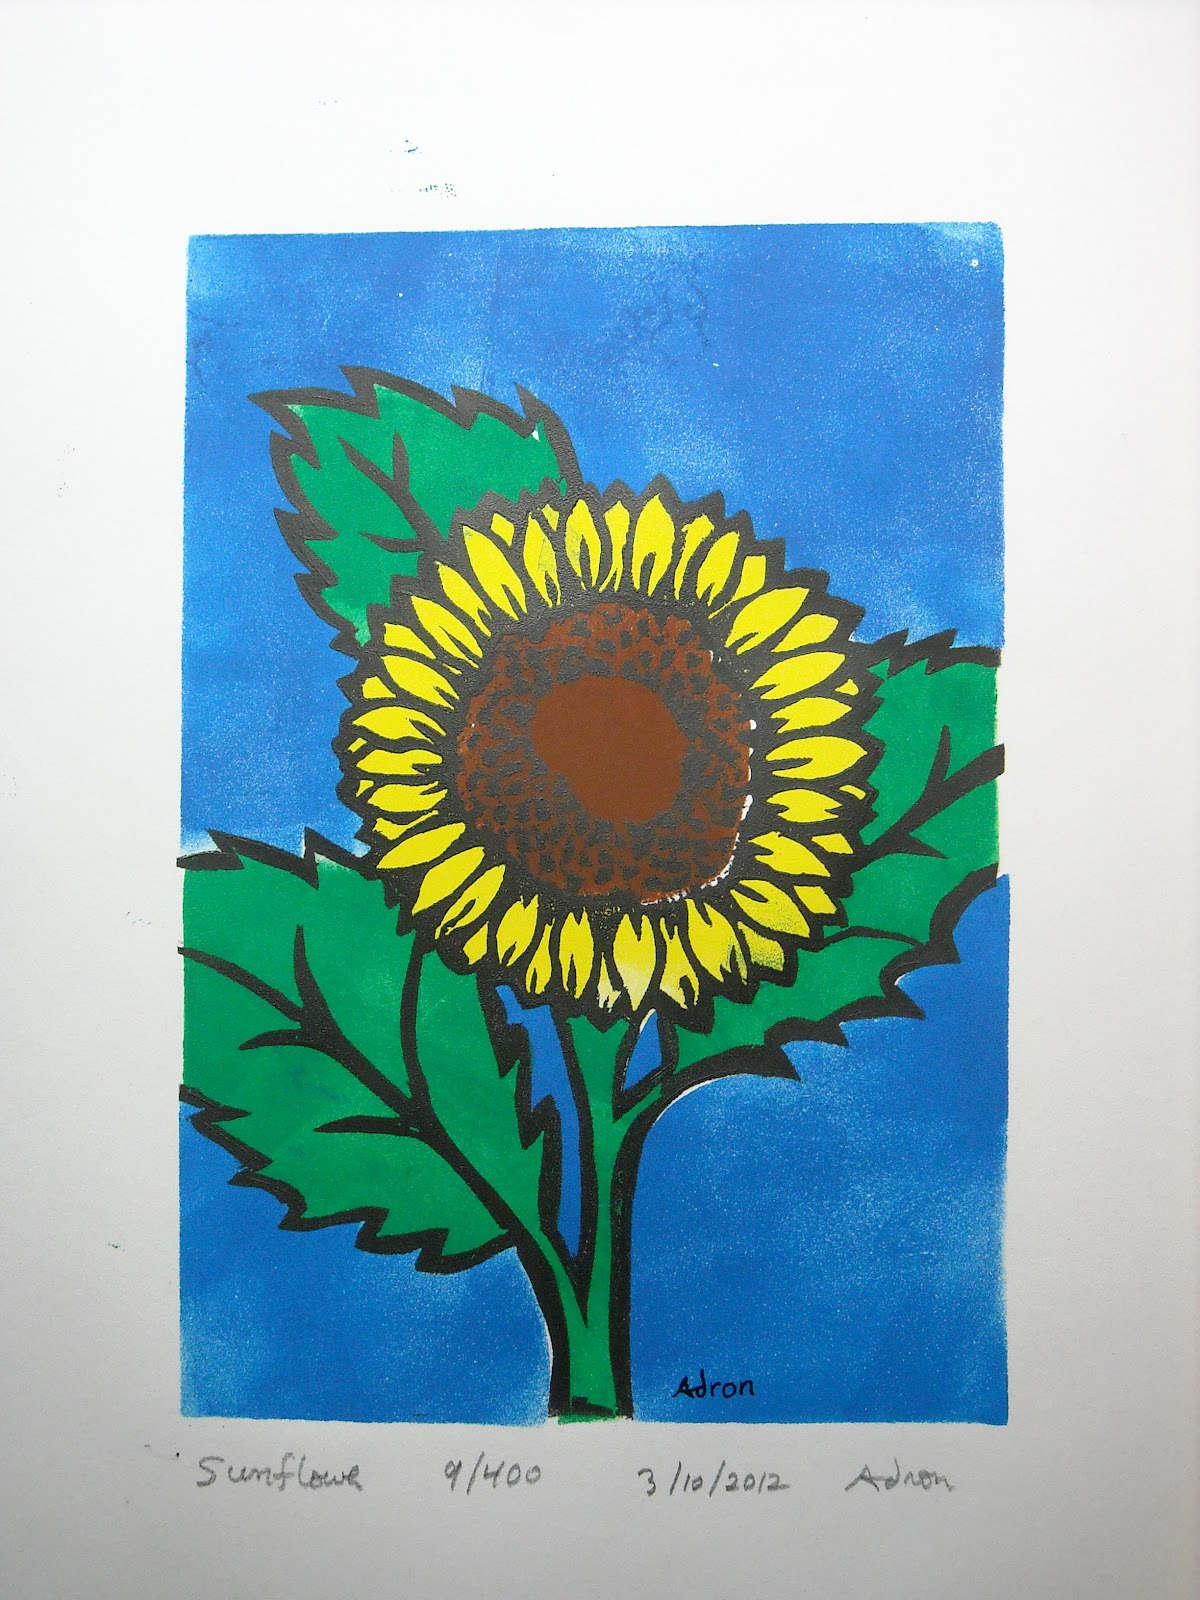 Artist Adron Sunflower Hand Made Print 14x11